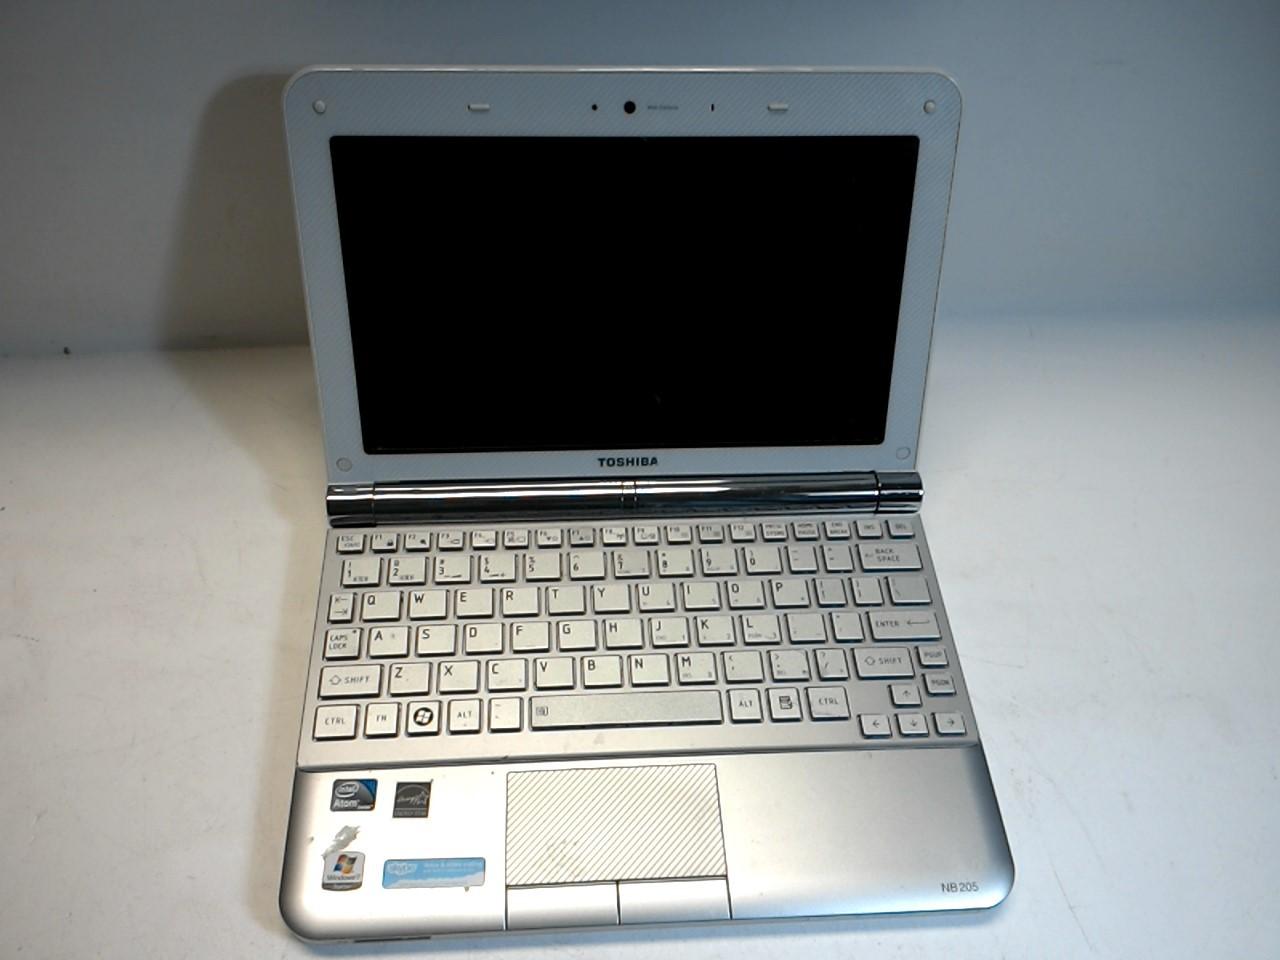 Toshiba NB205-N325WH Netbook Intel Atom CPU N280 1.66Ghz 1GB 160GB Wiped W/PSU - eBay